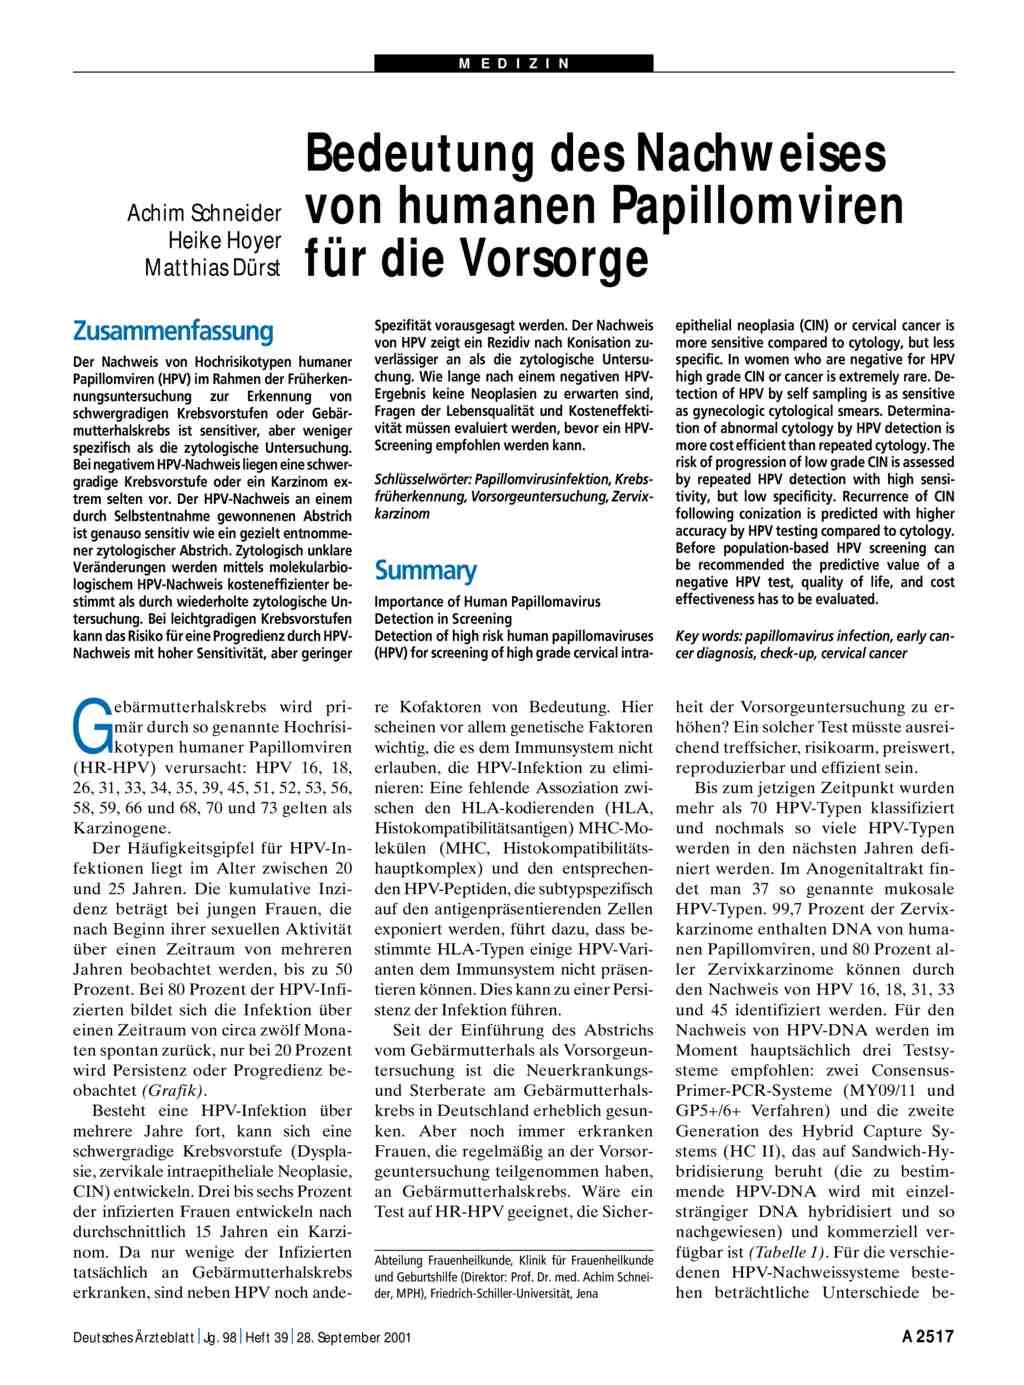 papilloma vírus hpv cin 1